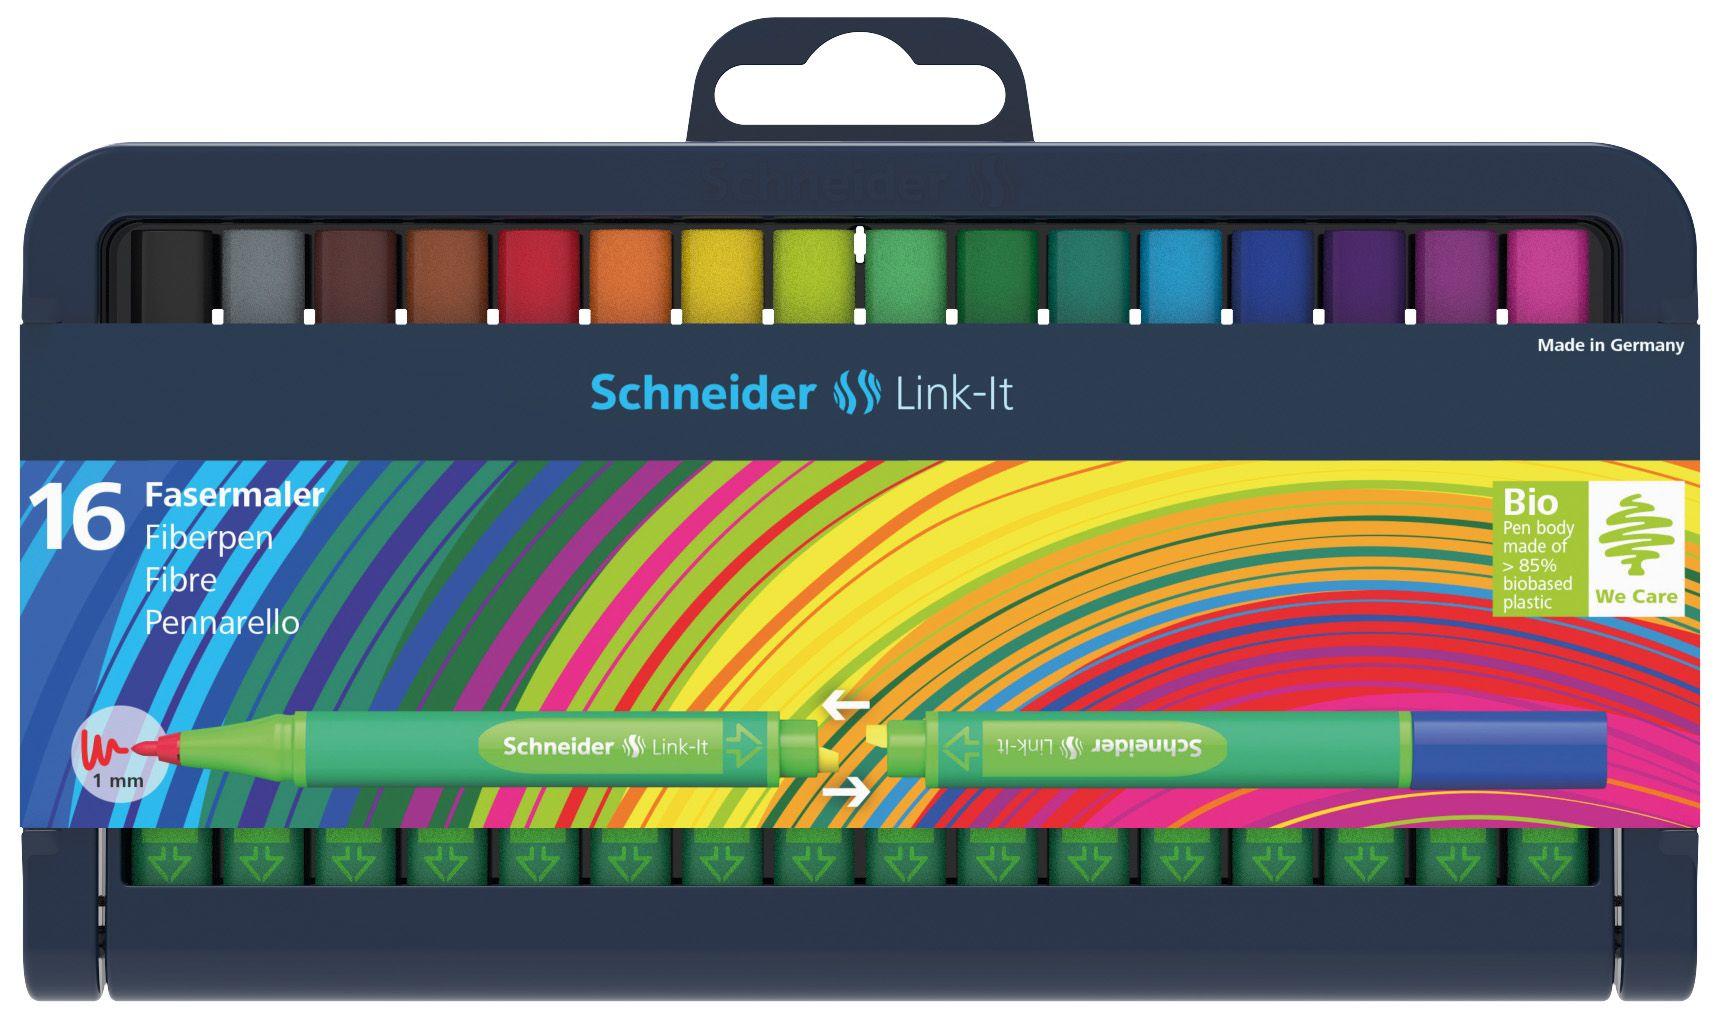 Flomasterių Link-It 1,0 mm rinkinys dėkle 16 vnt., SCHNEIDER